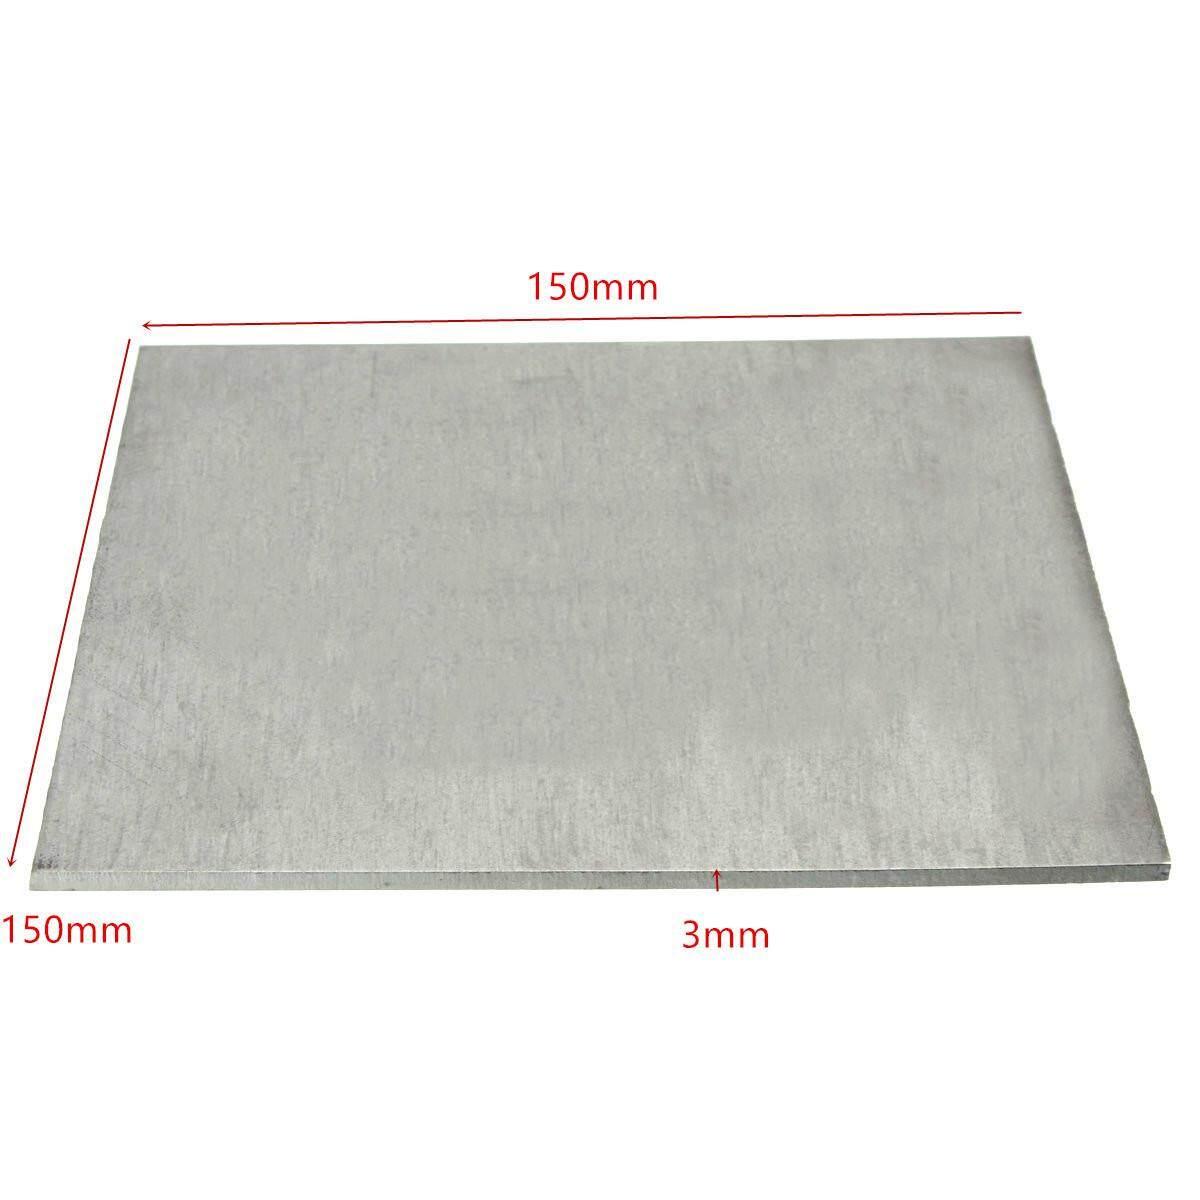 3mm Thick Titanium 6al-4v Sheet (  125